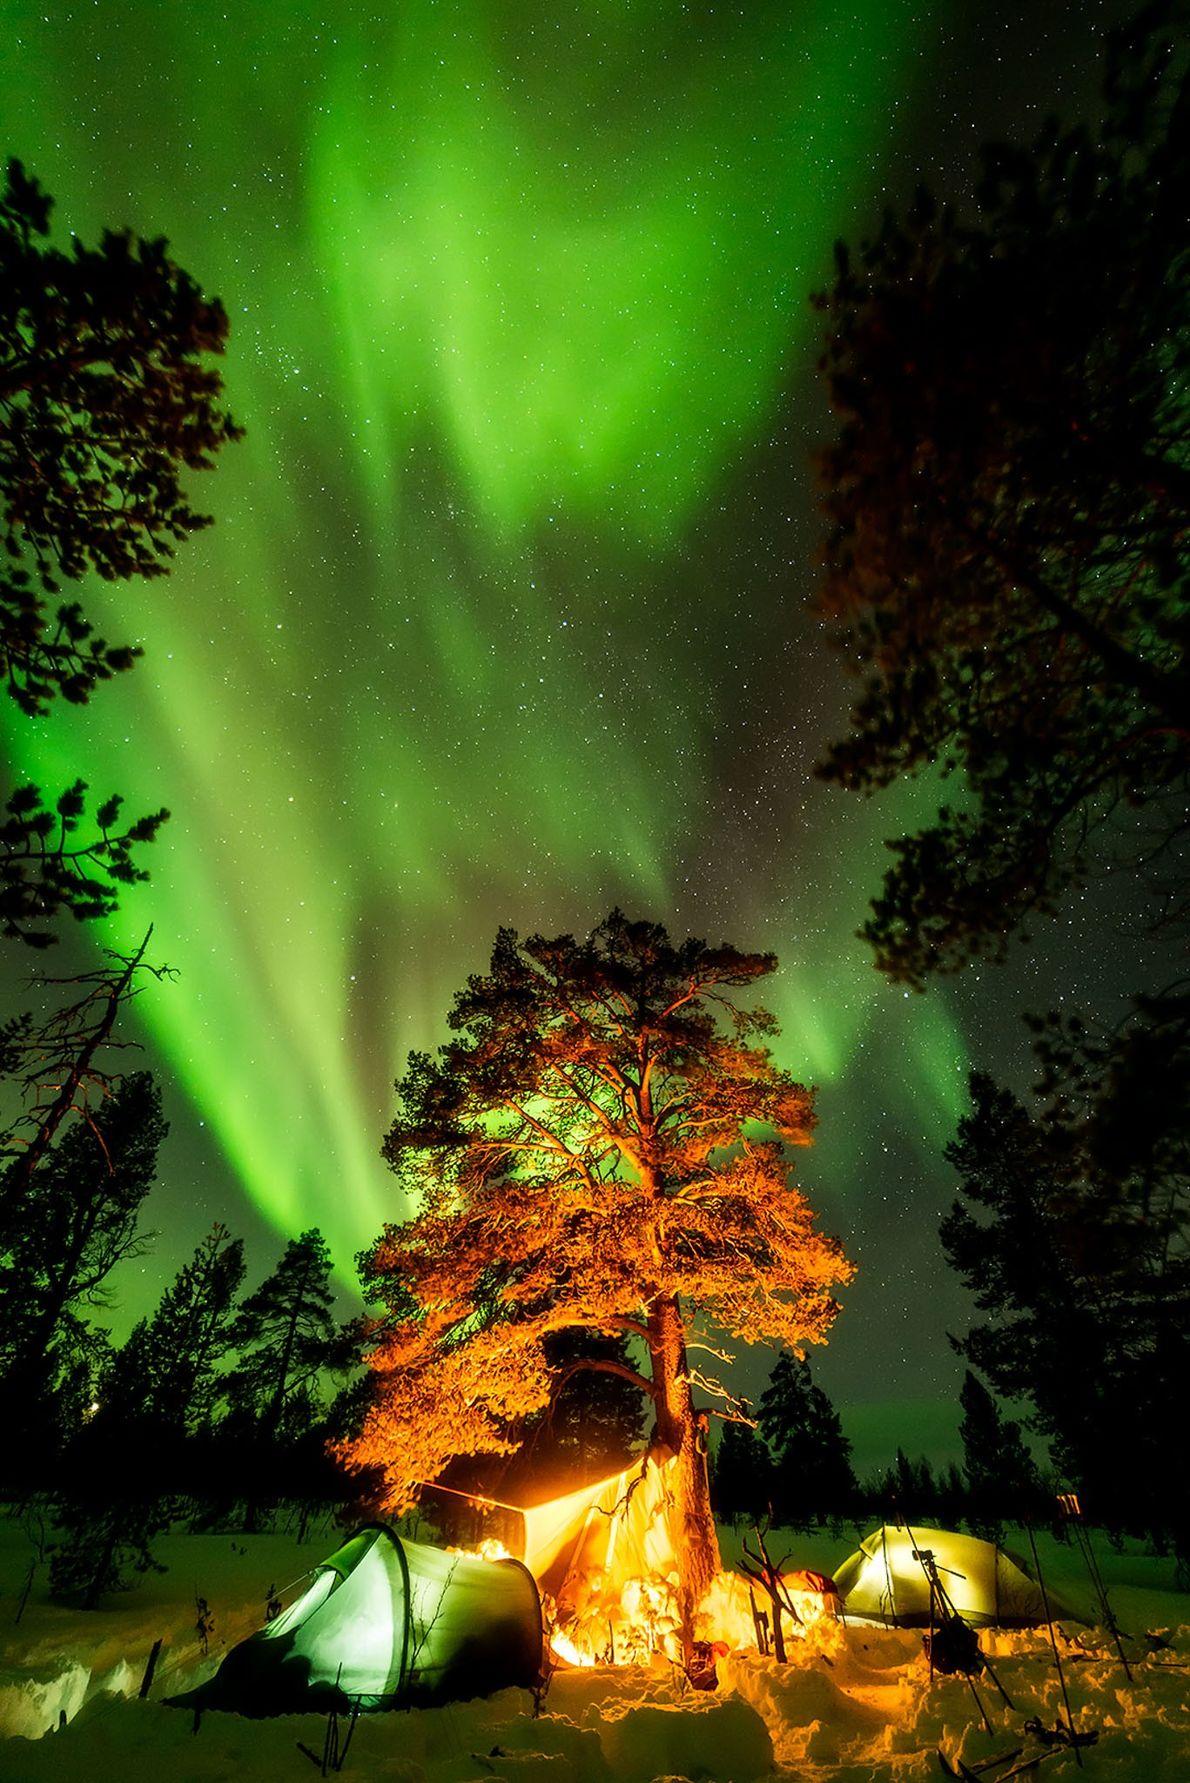 Parque nacional de Lemmenjoki, Laponia, Finlandia